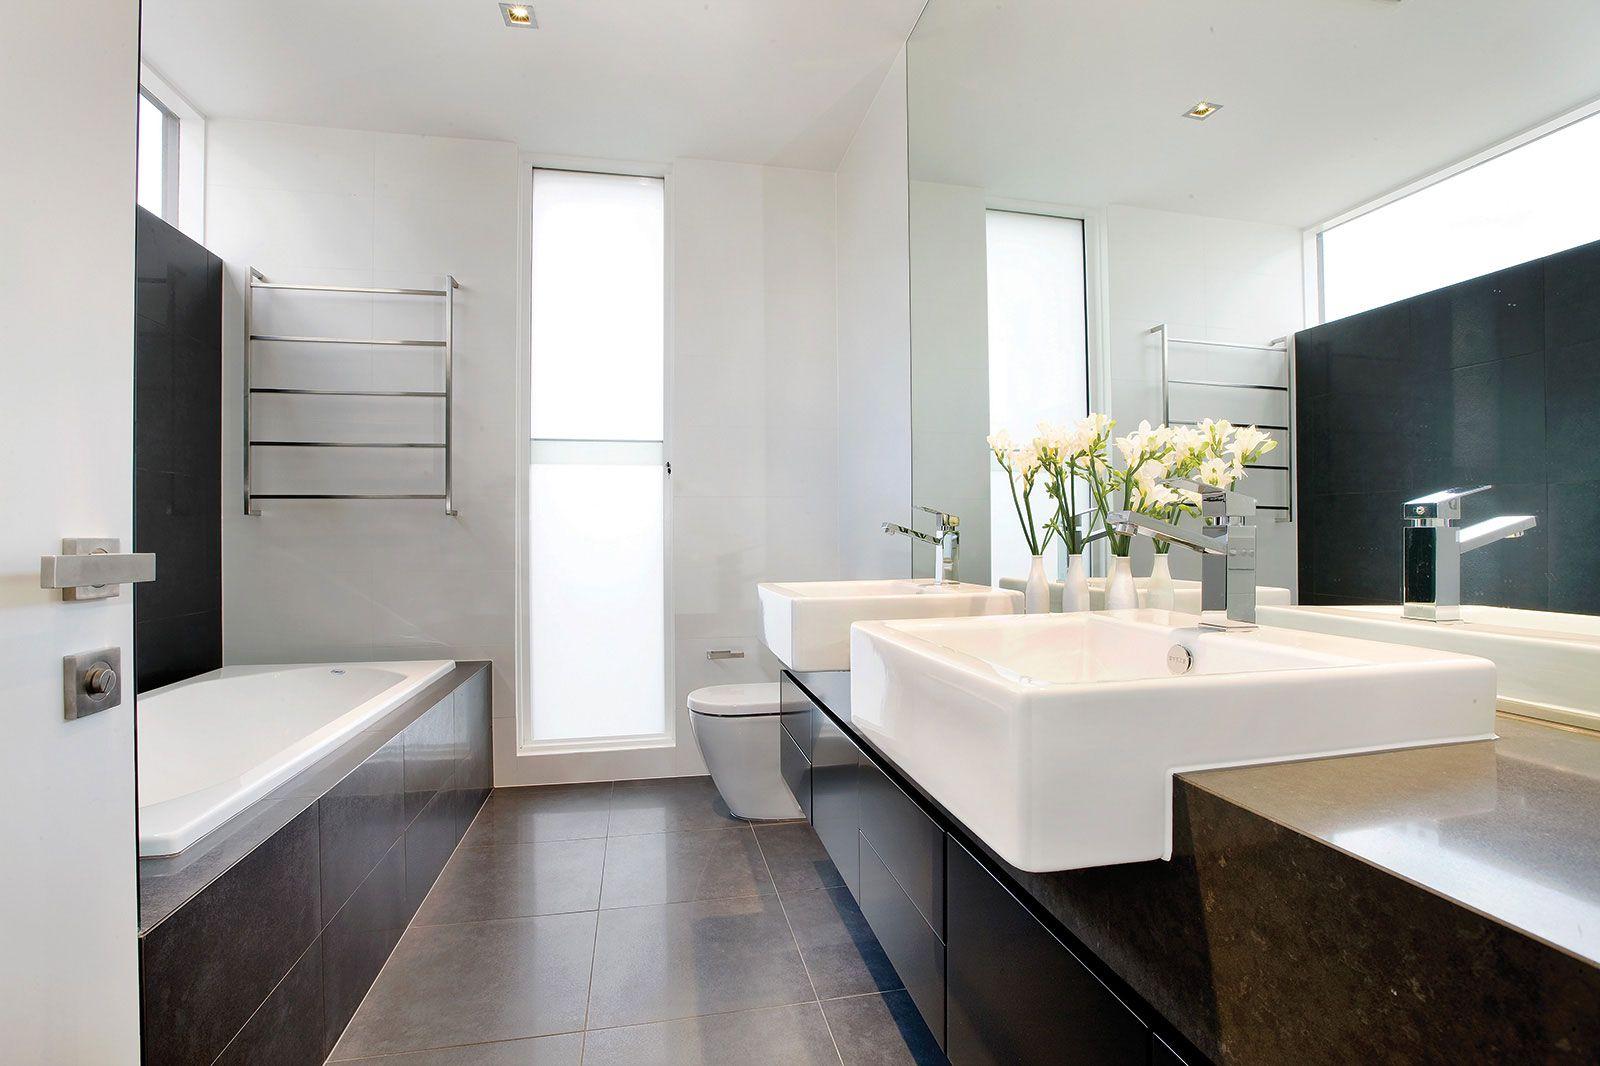 Armadale by Canny | Design Ideas | Pinterest | Bathroom inspiration ...